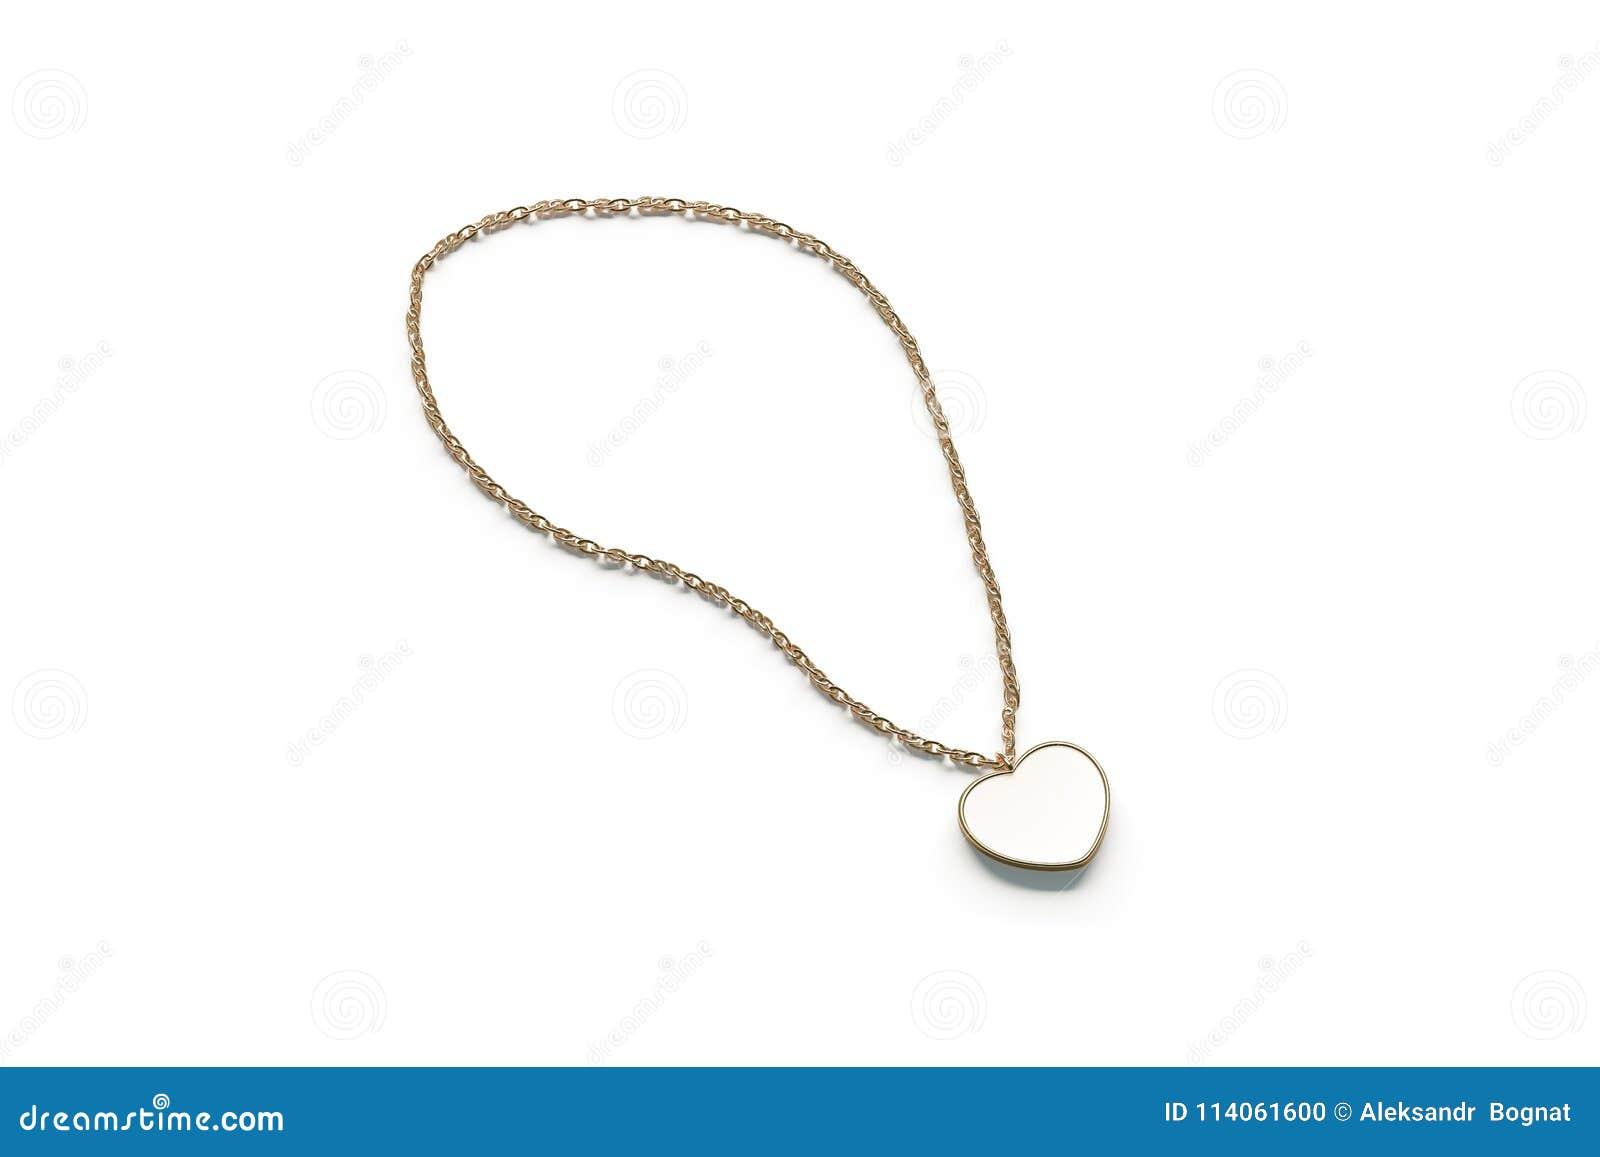 Blank White Golden Pendant Heart Mockup Isolated, Stock Photo